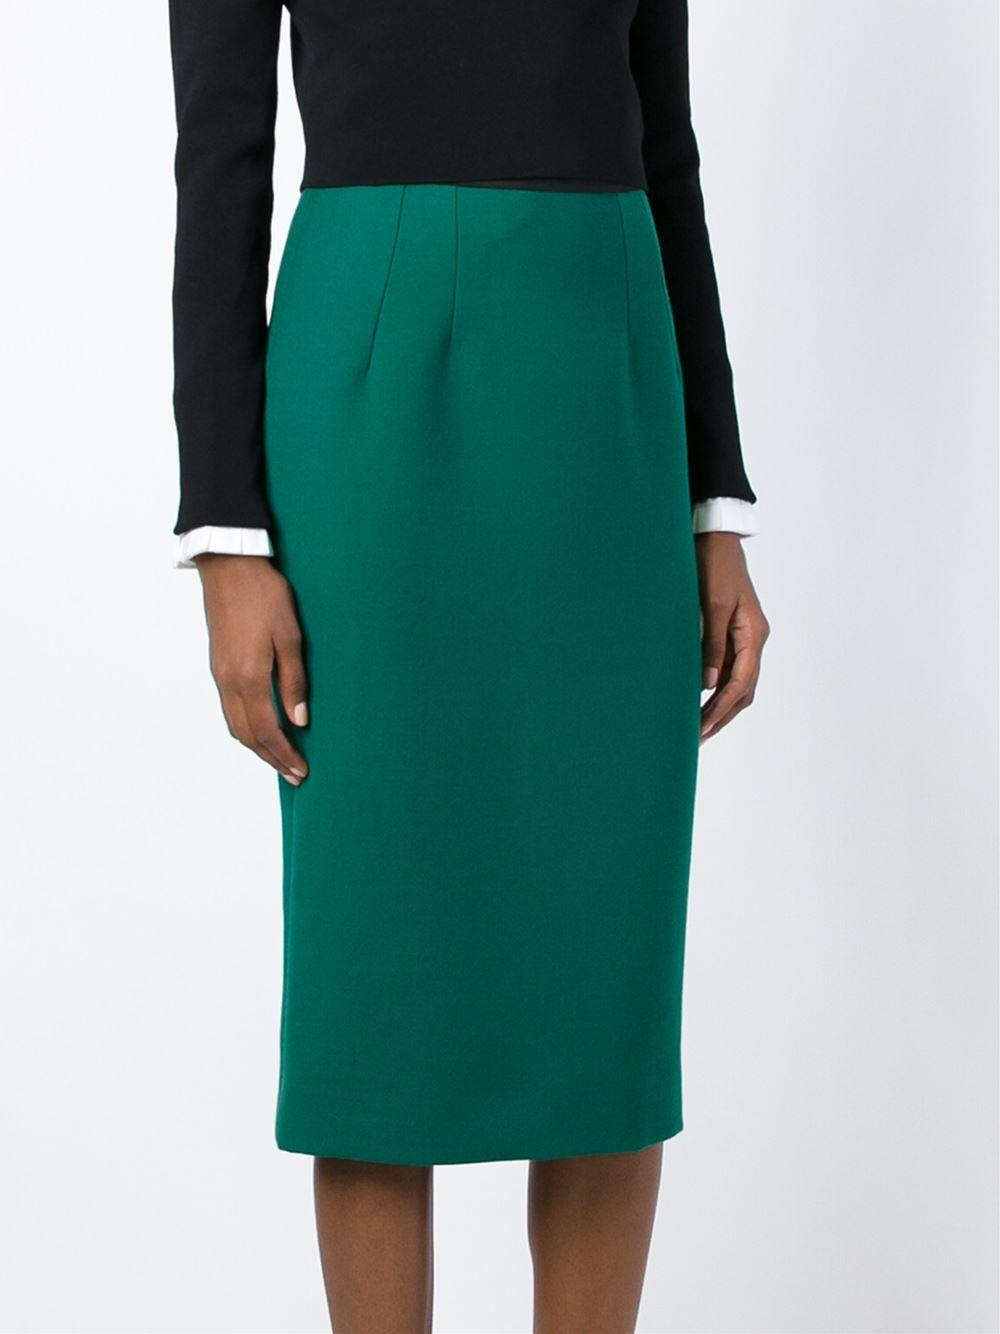 dolce gabbana midi pencil skirt in green lyst